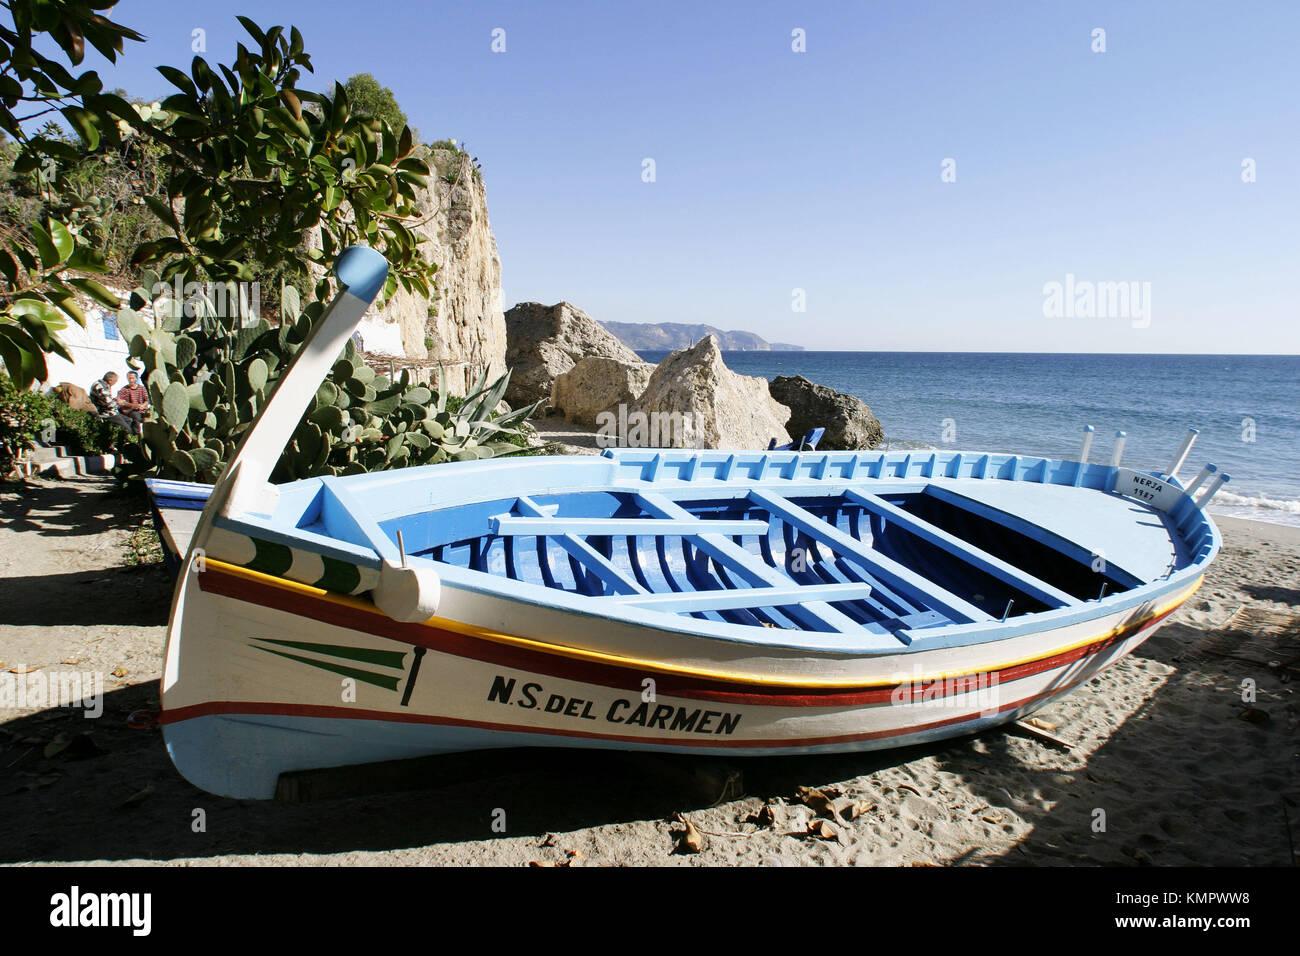 Fishing smack on Calahonda beach. Nerja. Costa del Sol, Málaga province. Spain - Stock Image